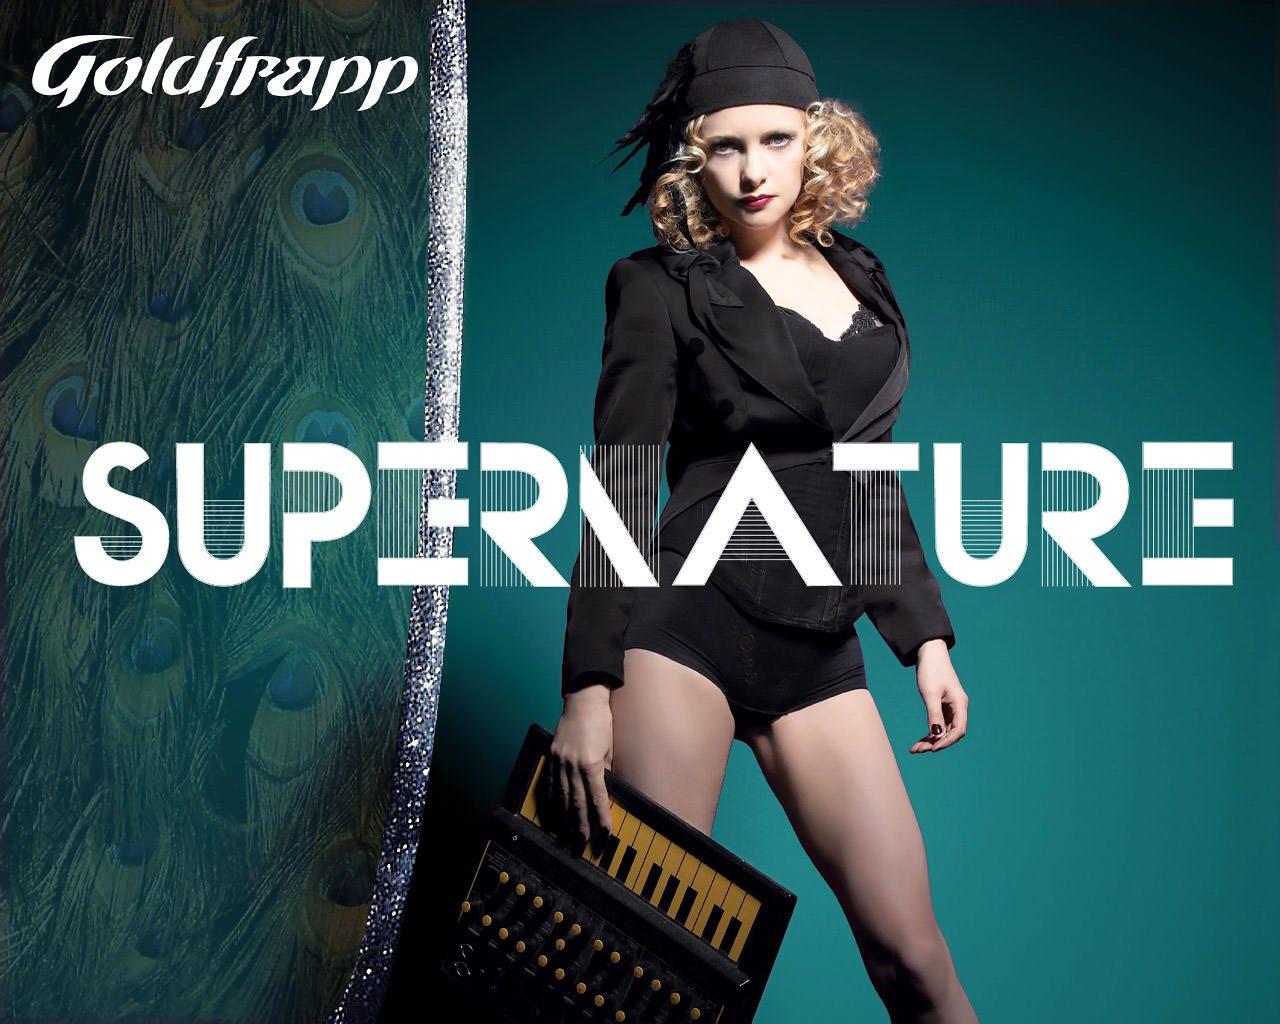 goldfrapp_supernature.jpg